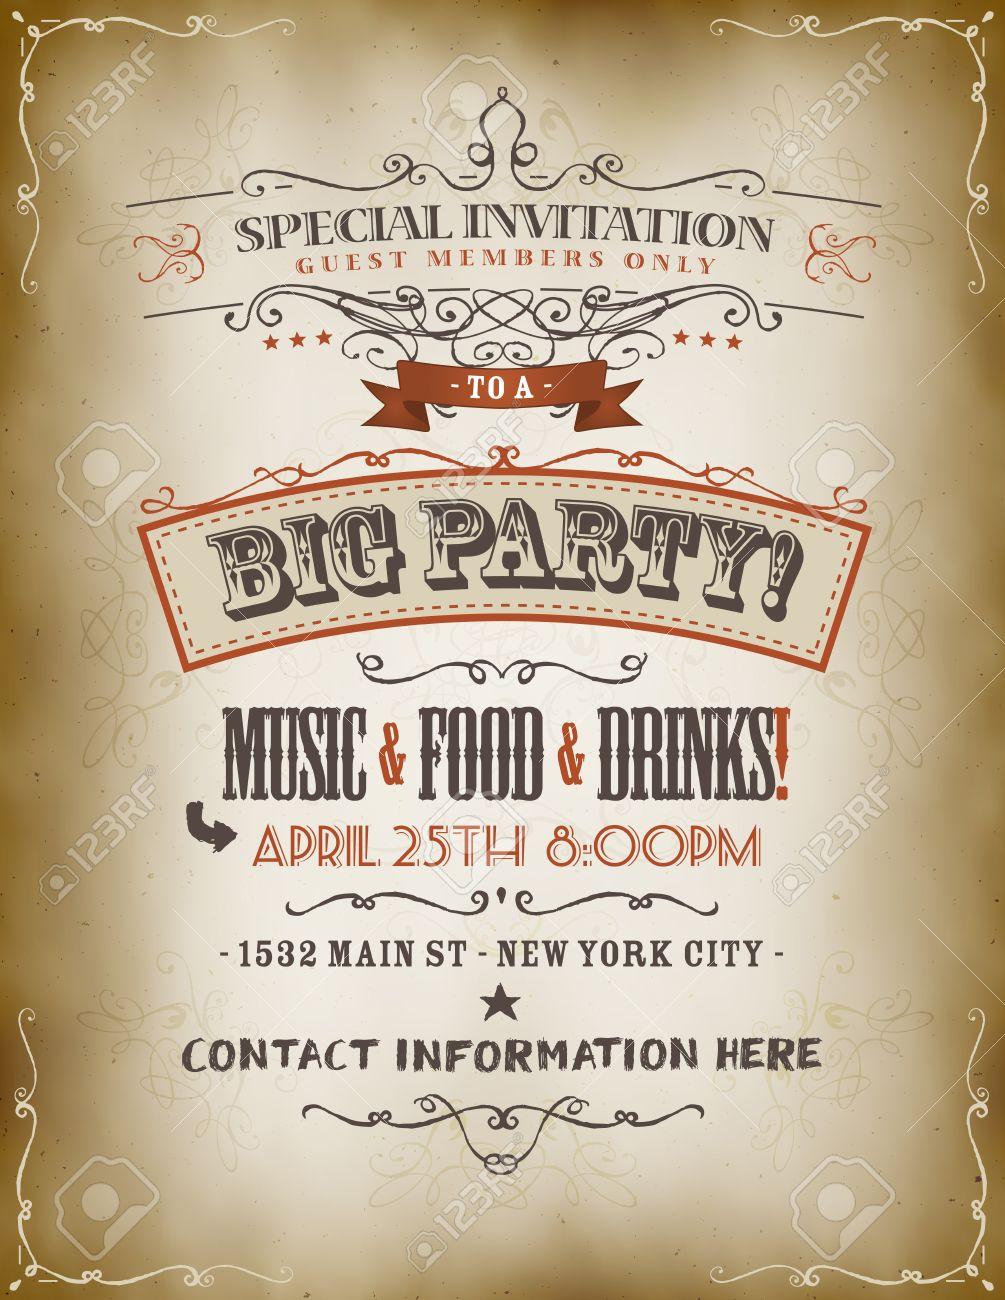 Illustration of a retro vintage invitation poster to a big party illustration of a retro vintage invitation poster to a big party with floral patterns sketched stopboris Gallery